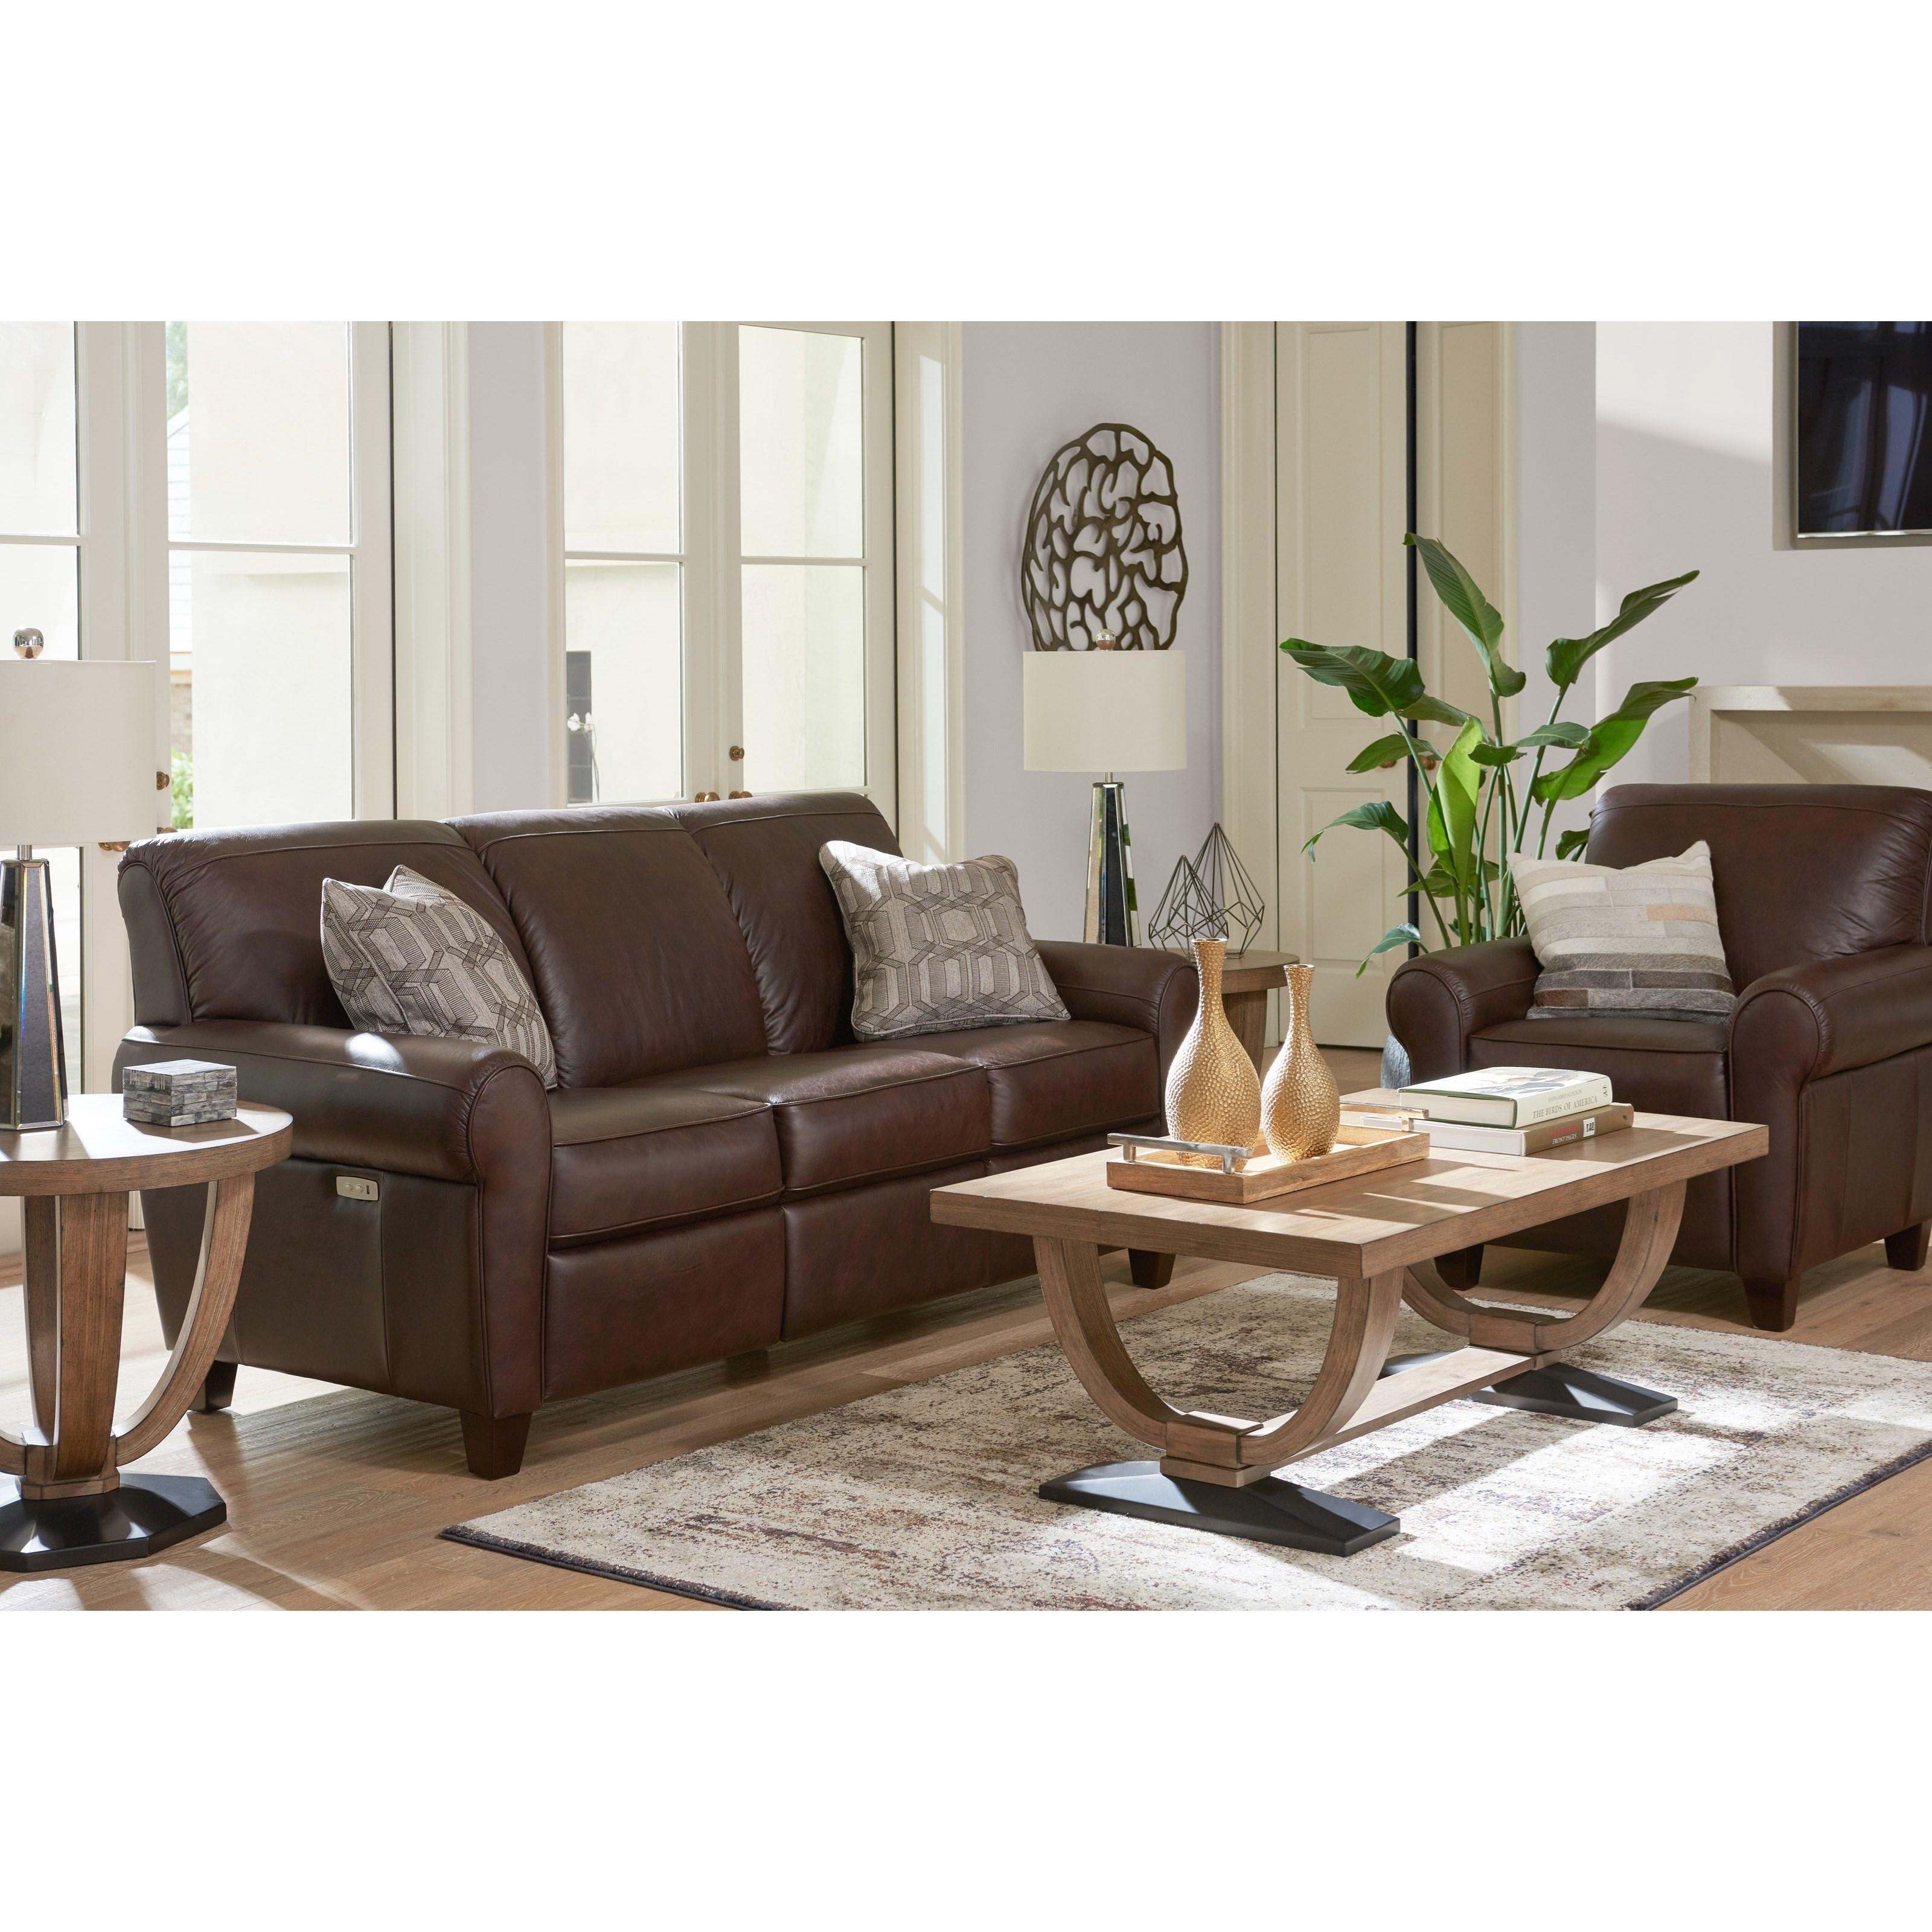 La Z Boy Bennett Reclining Living Room Group Zak 39 S Fine Furniture Reclining Living Room Groups